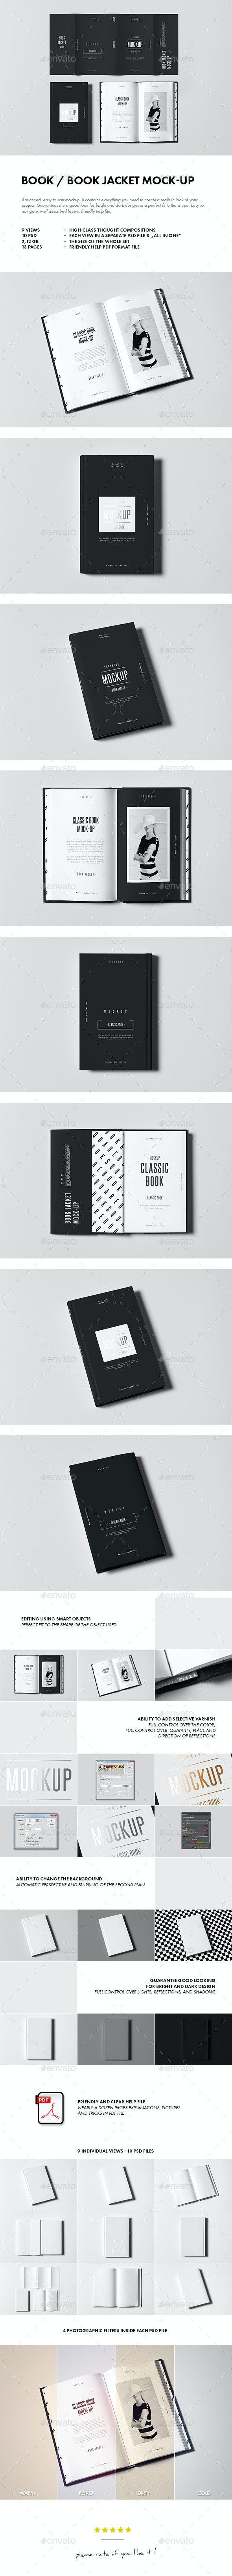 Book / Book Jacket Mock-up - Books Print